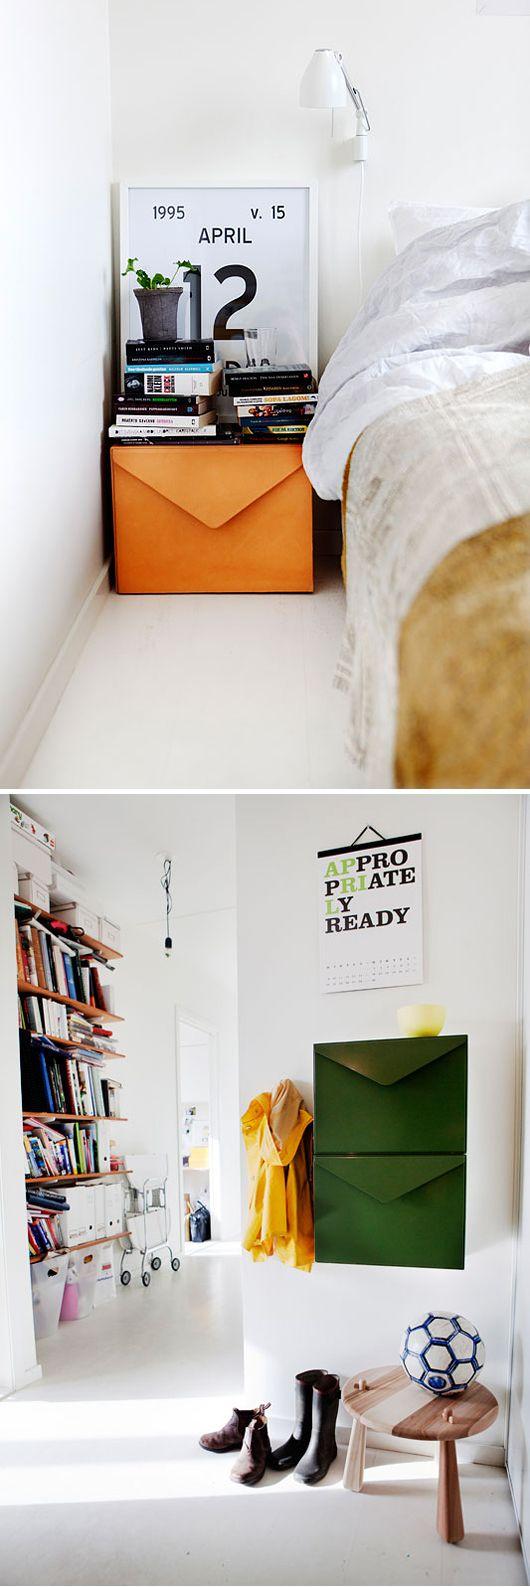 Leather envelope cabinets. By Swedish furniture designer Emma Olbers.